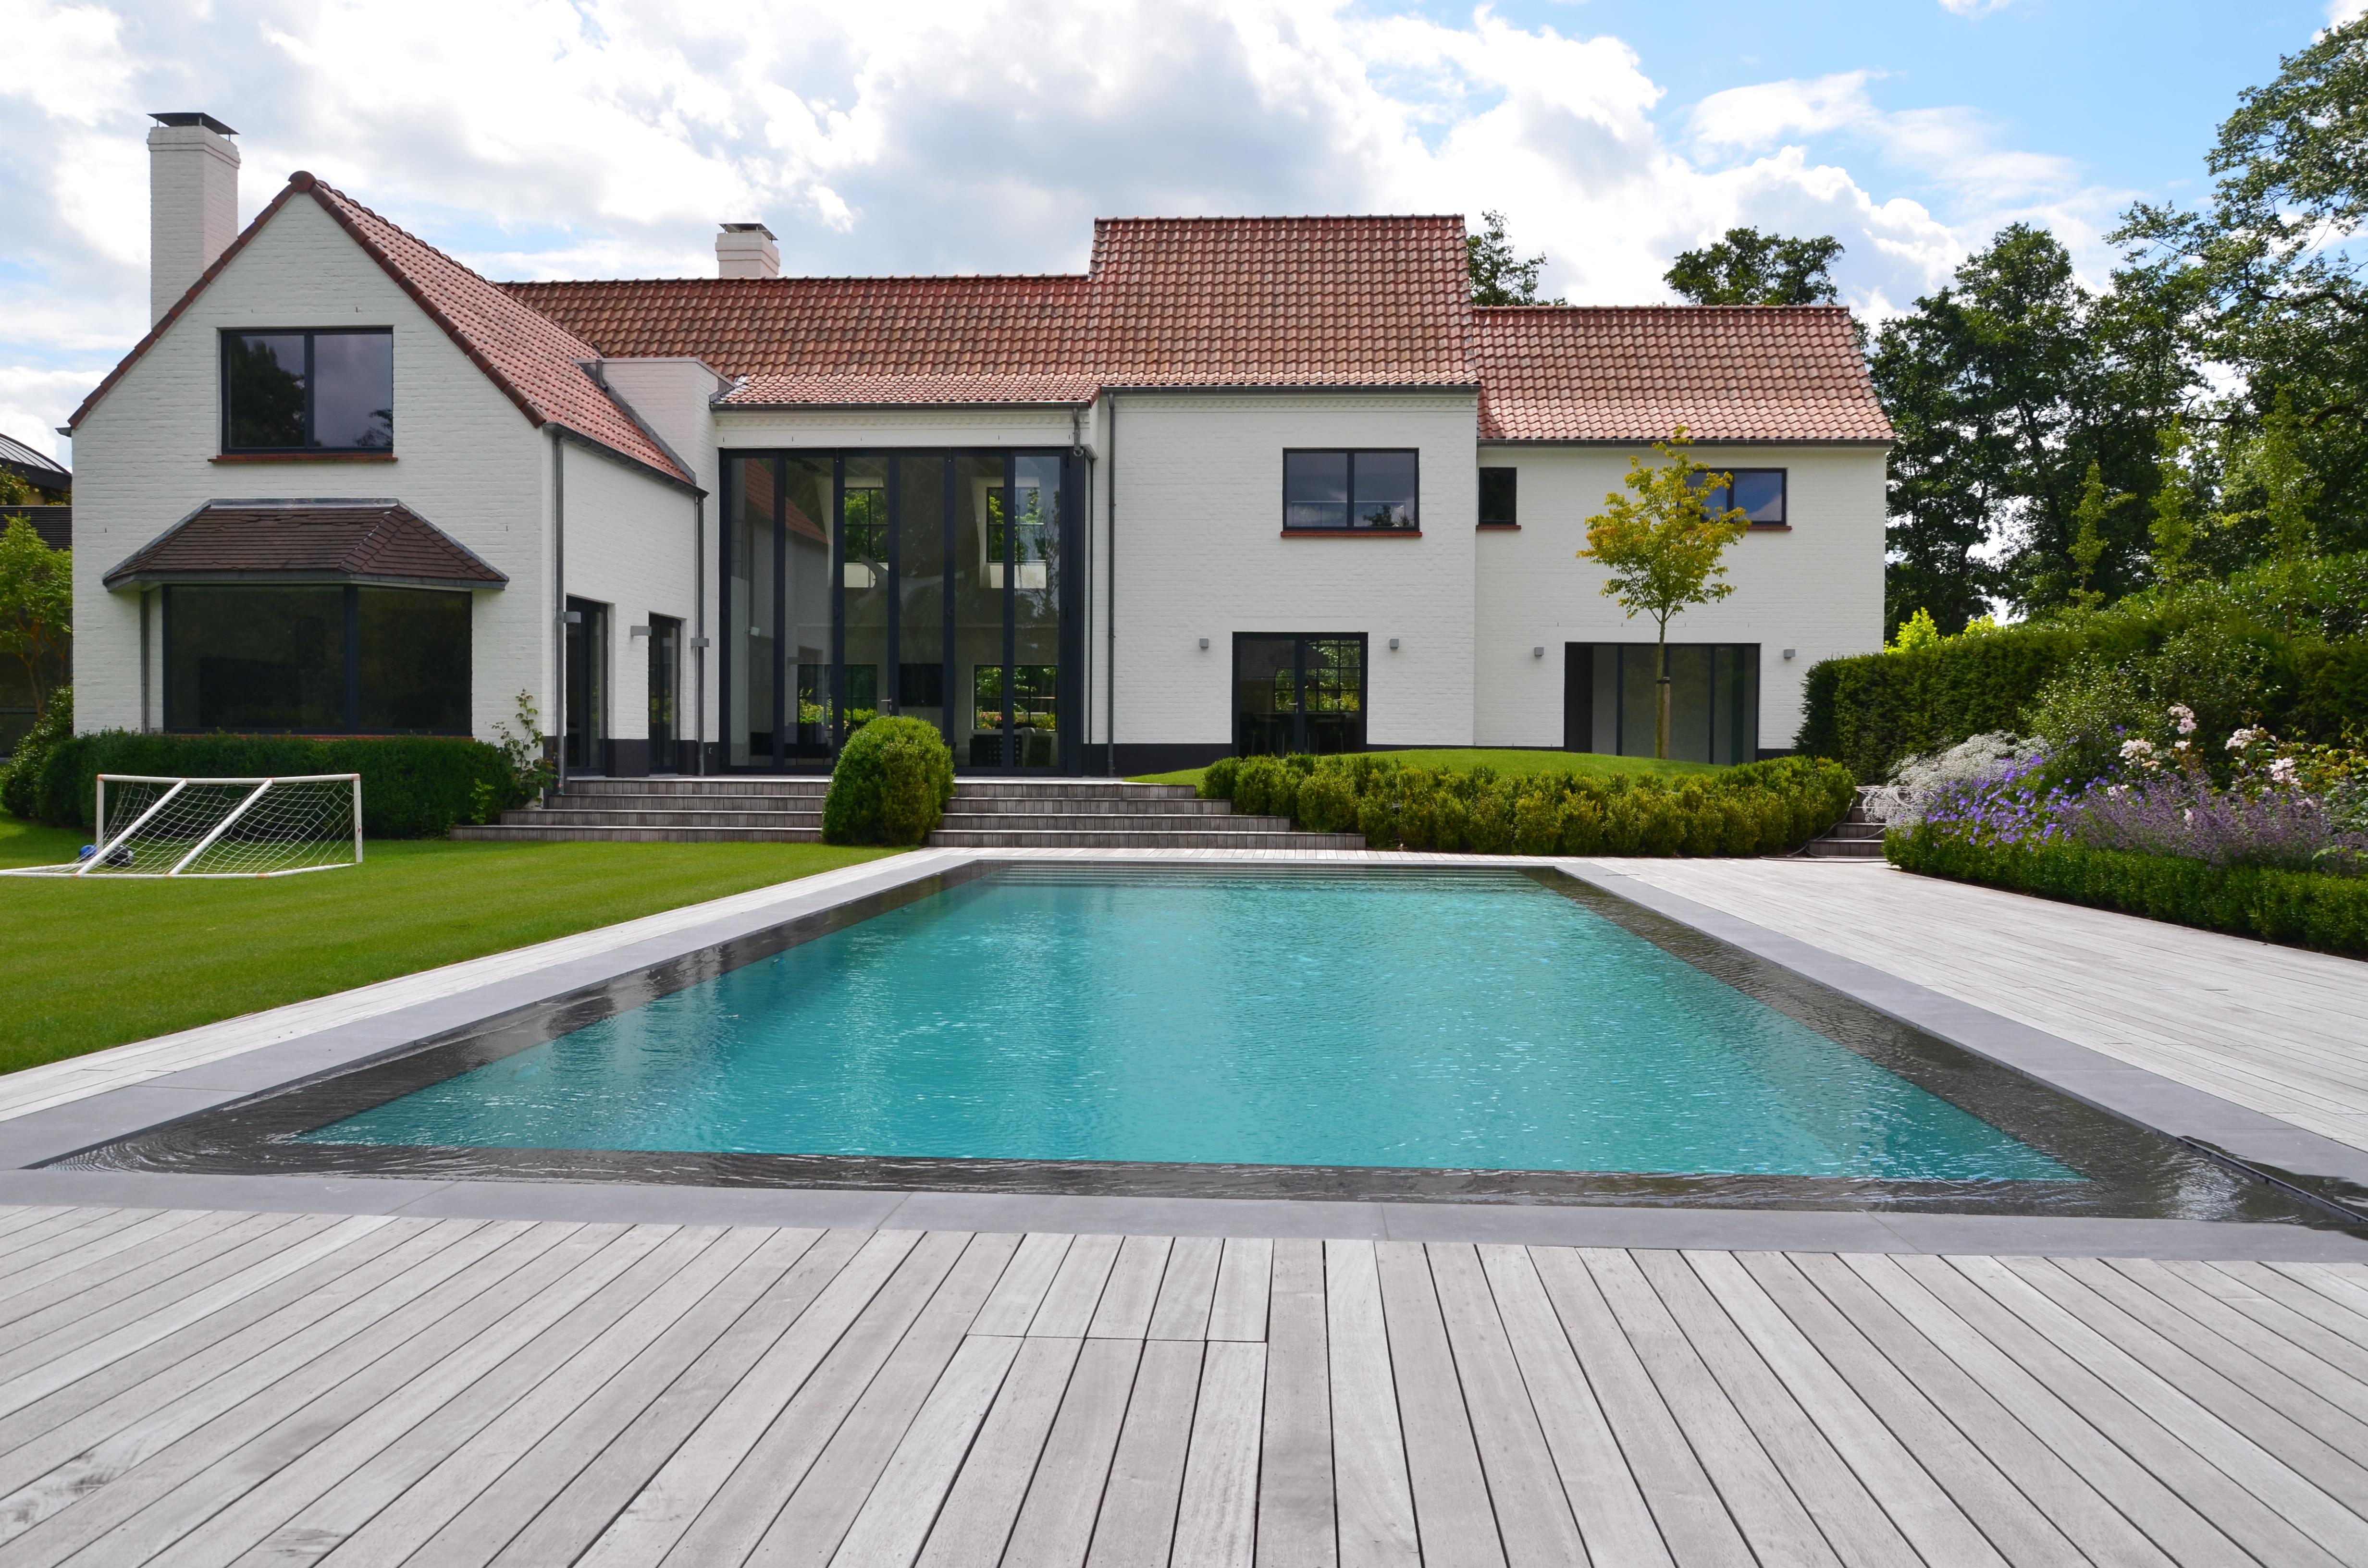 Stijlvol overloopbad in Sint-Martens-Latem